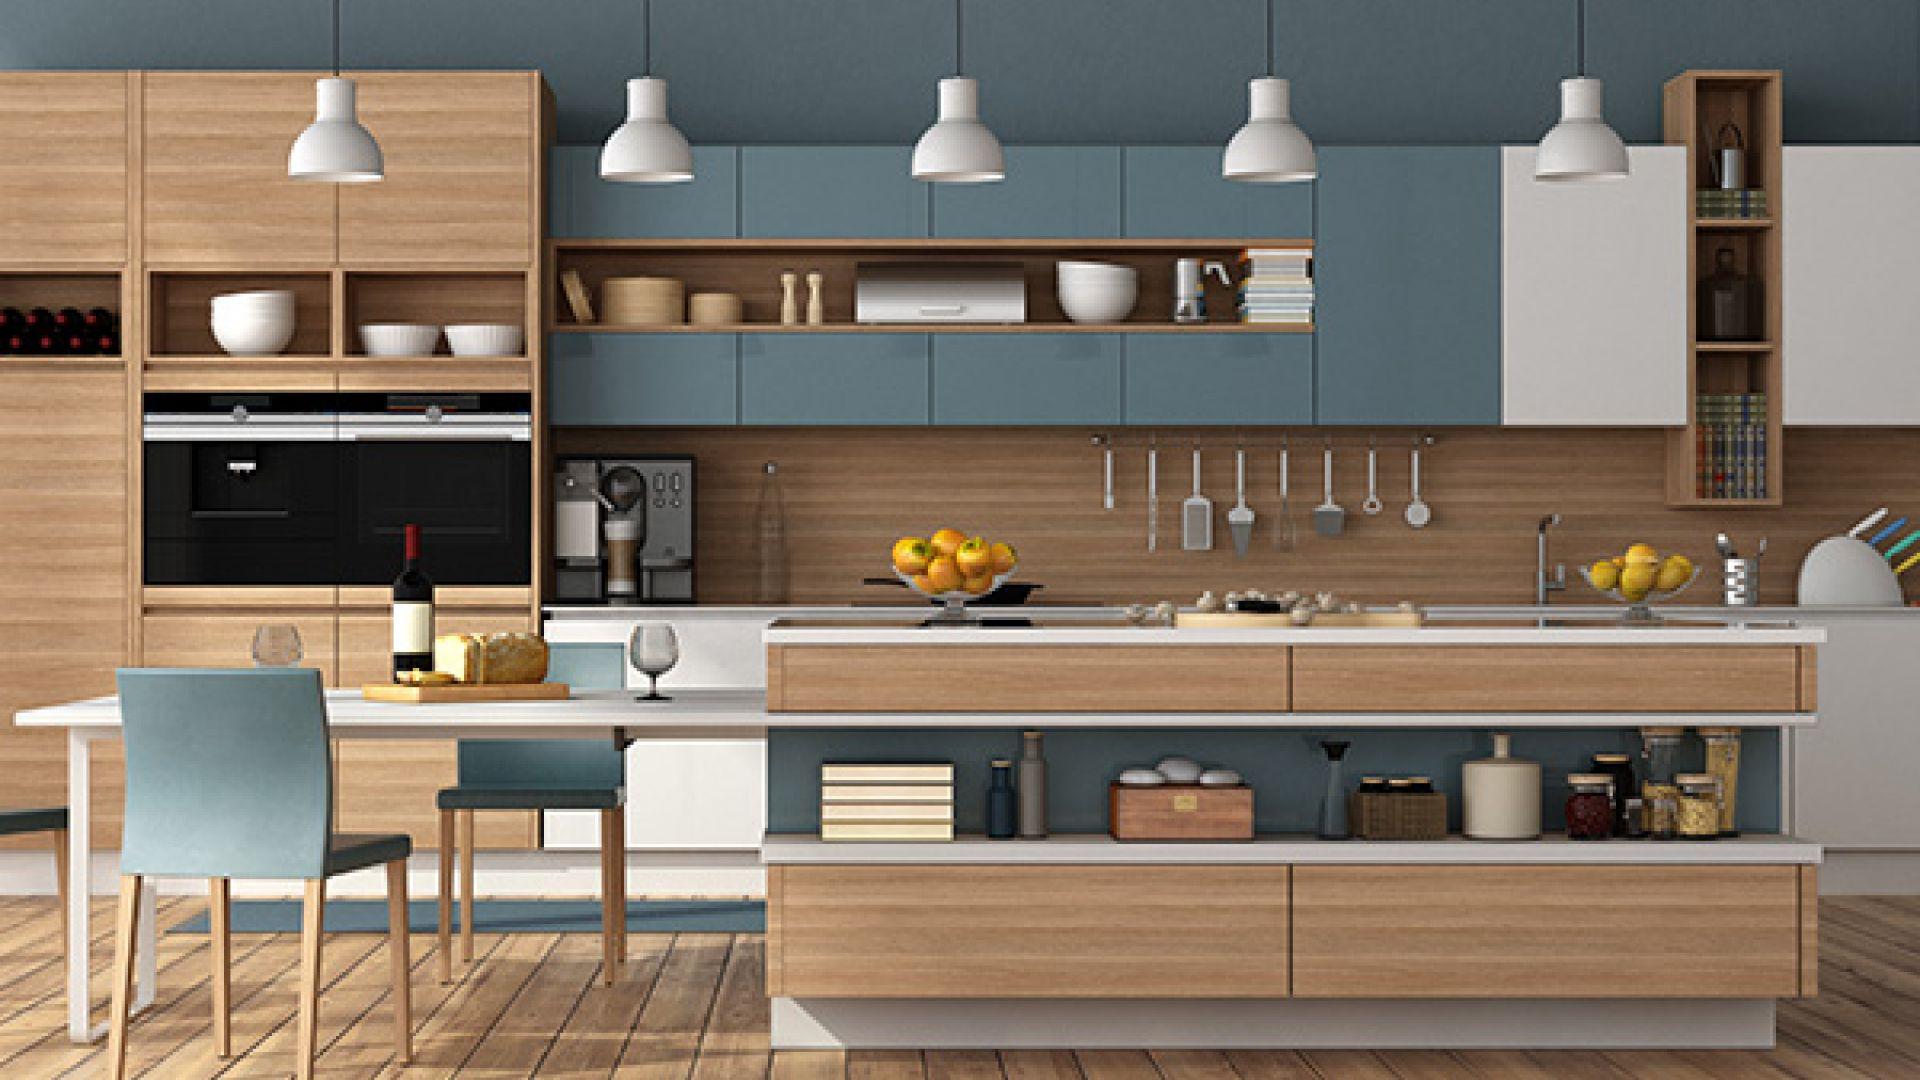 Cocinas pintadas sin azulejos